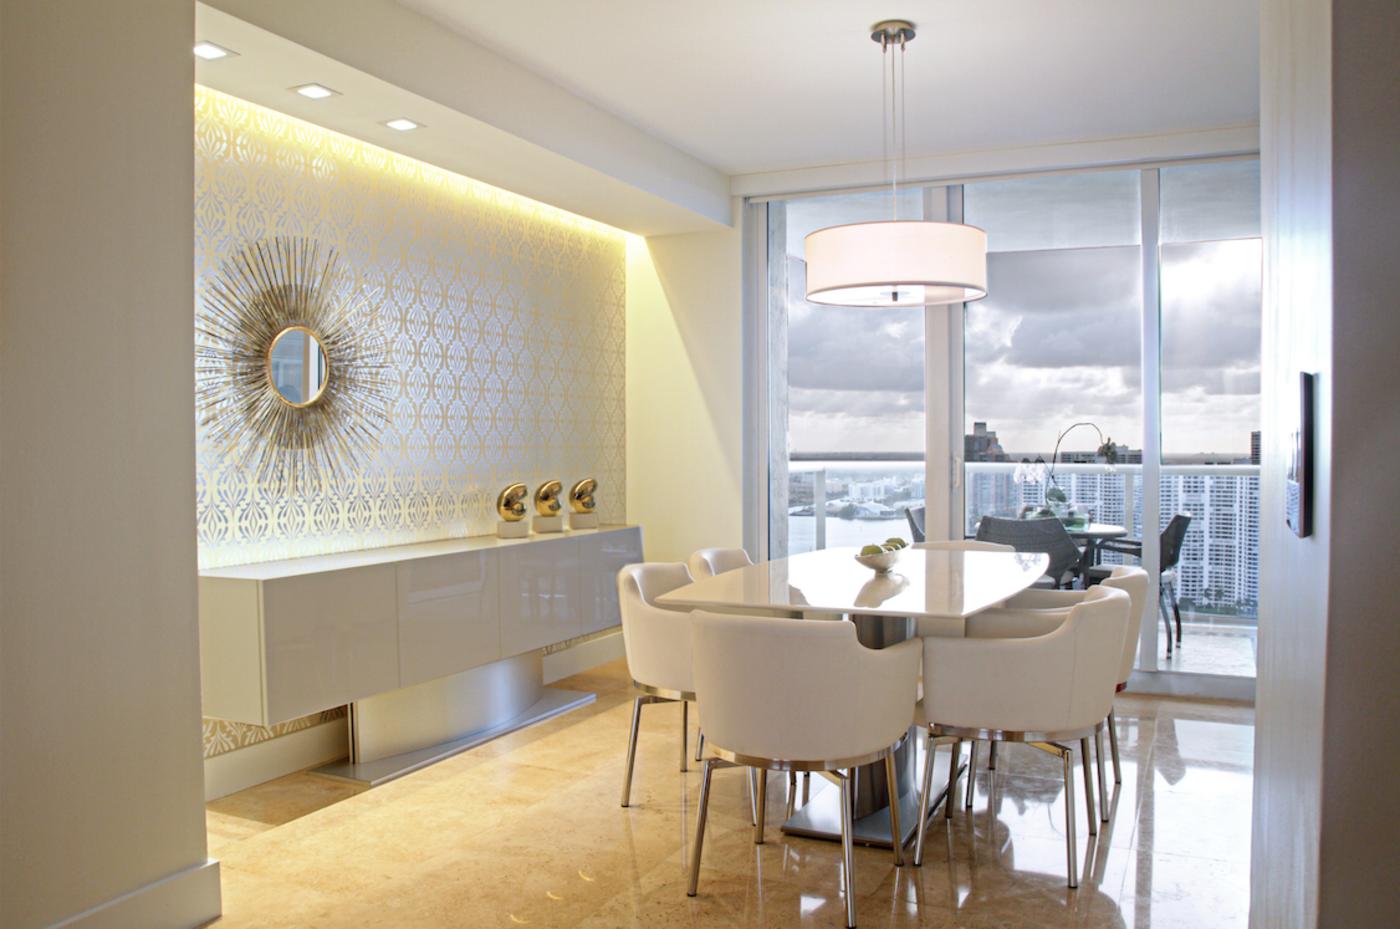 Sunny isles penthouse by interiors by maite granda inc lookbook